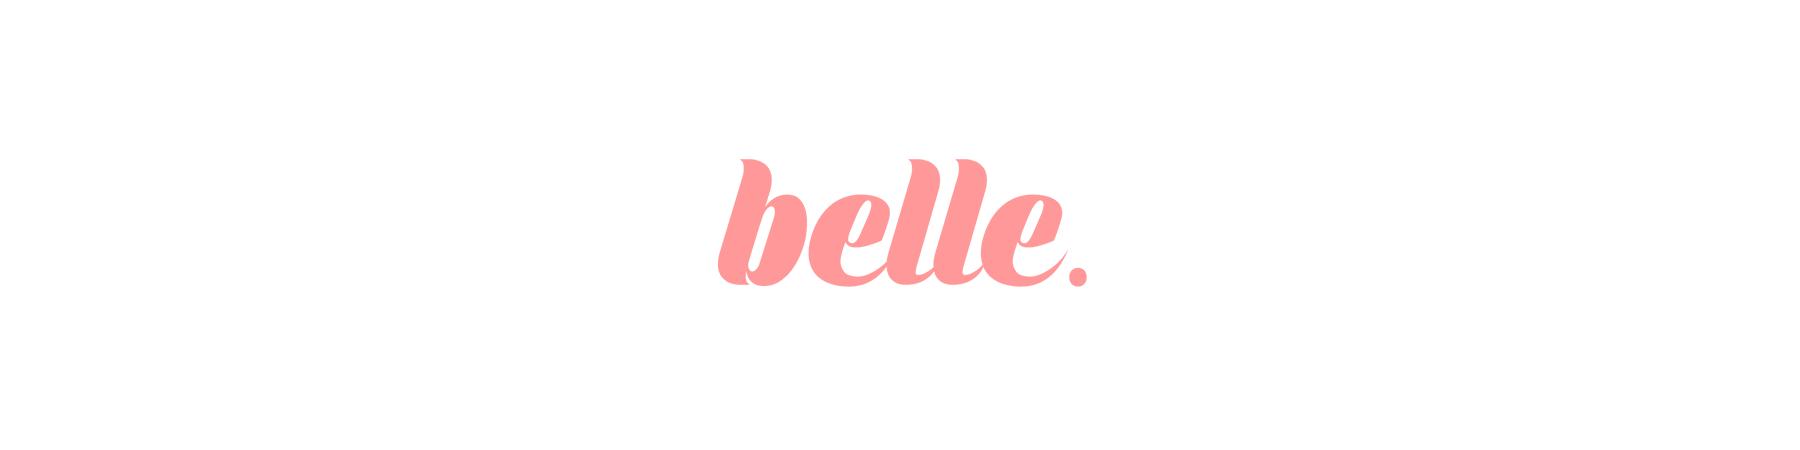 BelleFooter.png